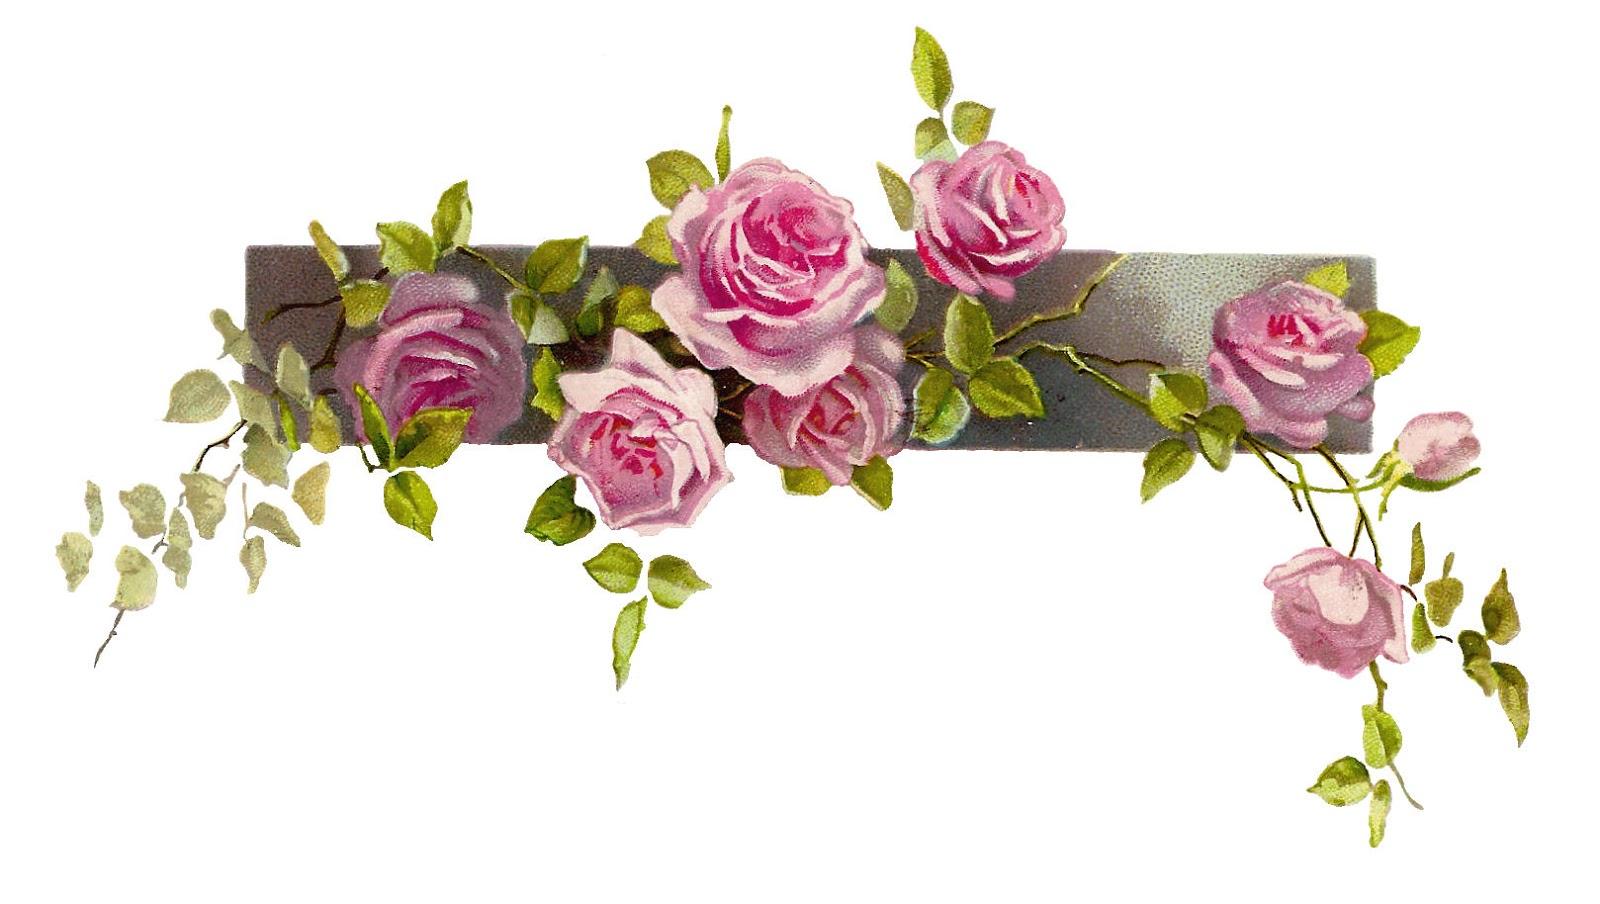 Pink flowers drawing 27 background wallpaper hdflowerwallpaper pink flowers drawing free wallpaper mightylinksfo